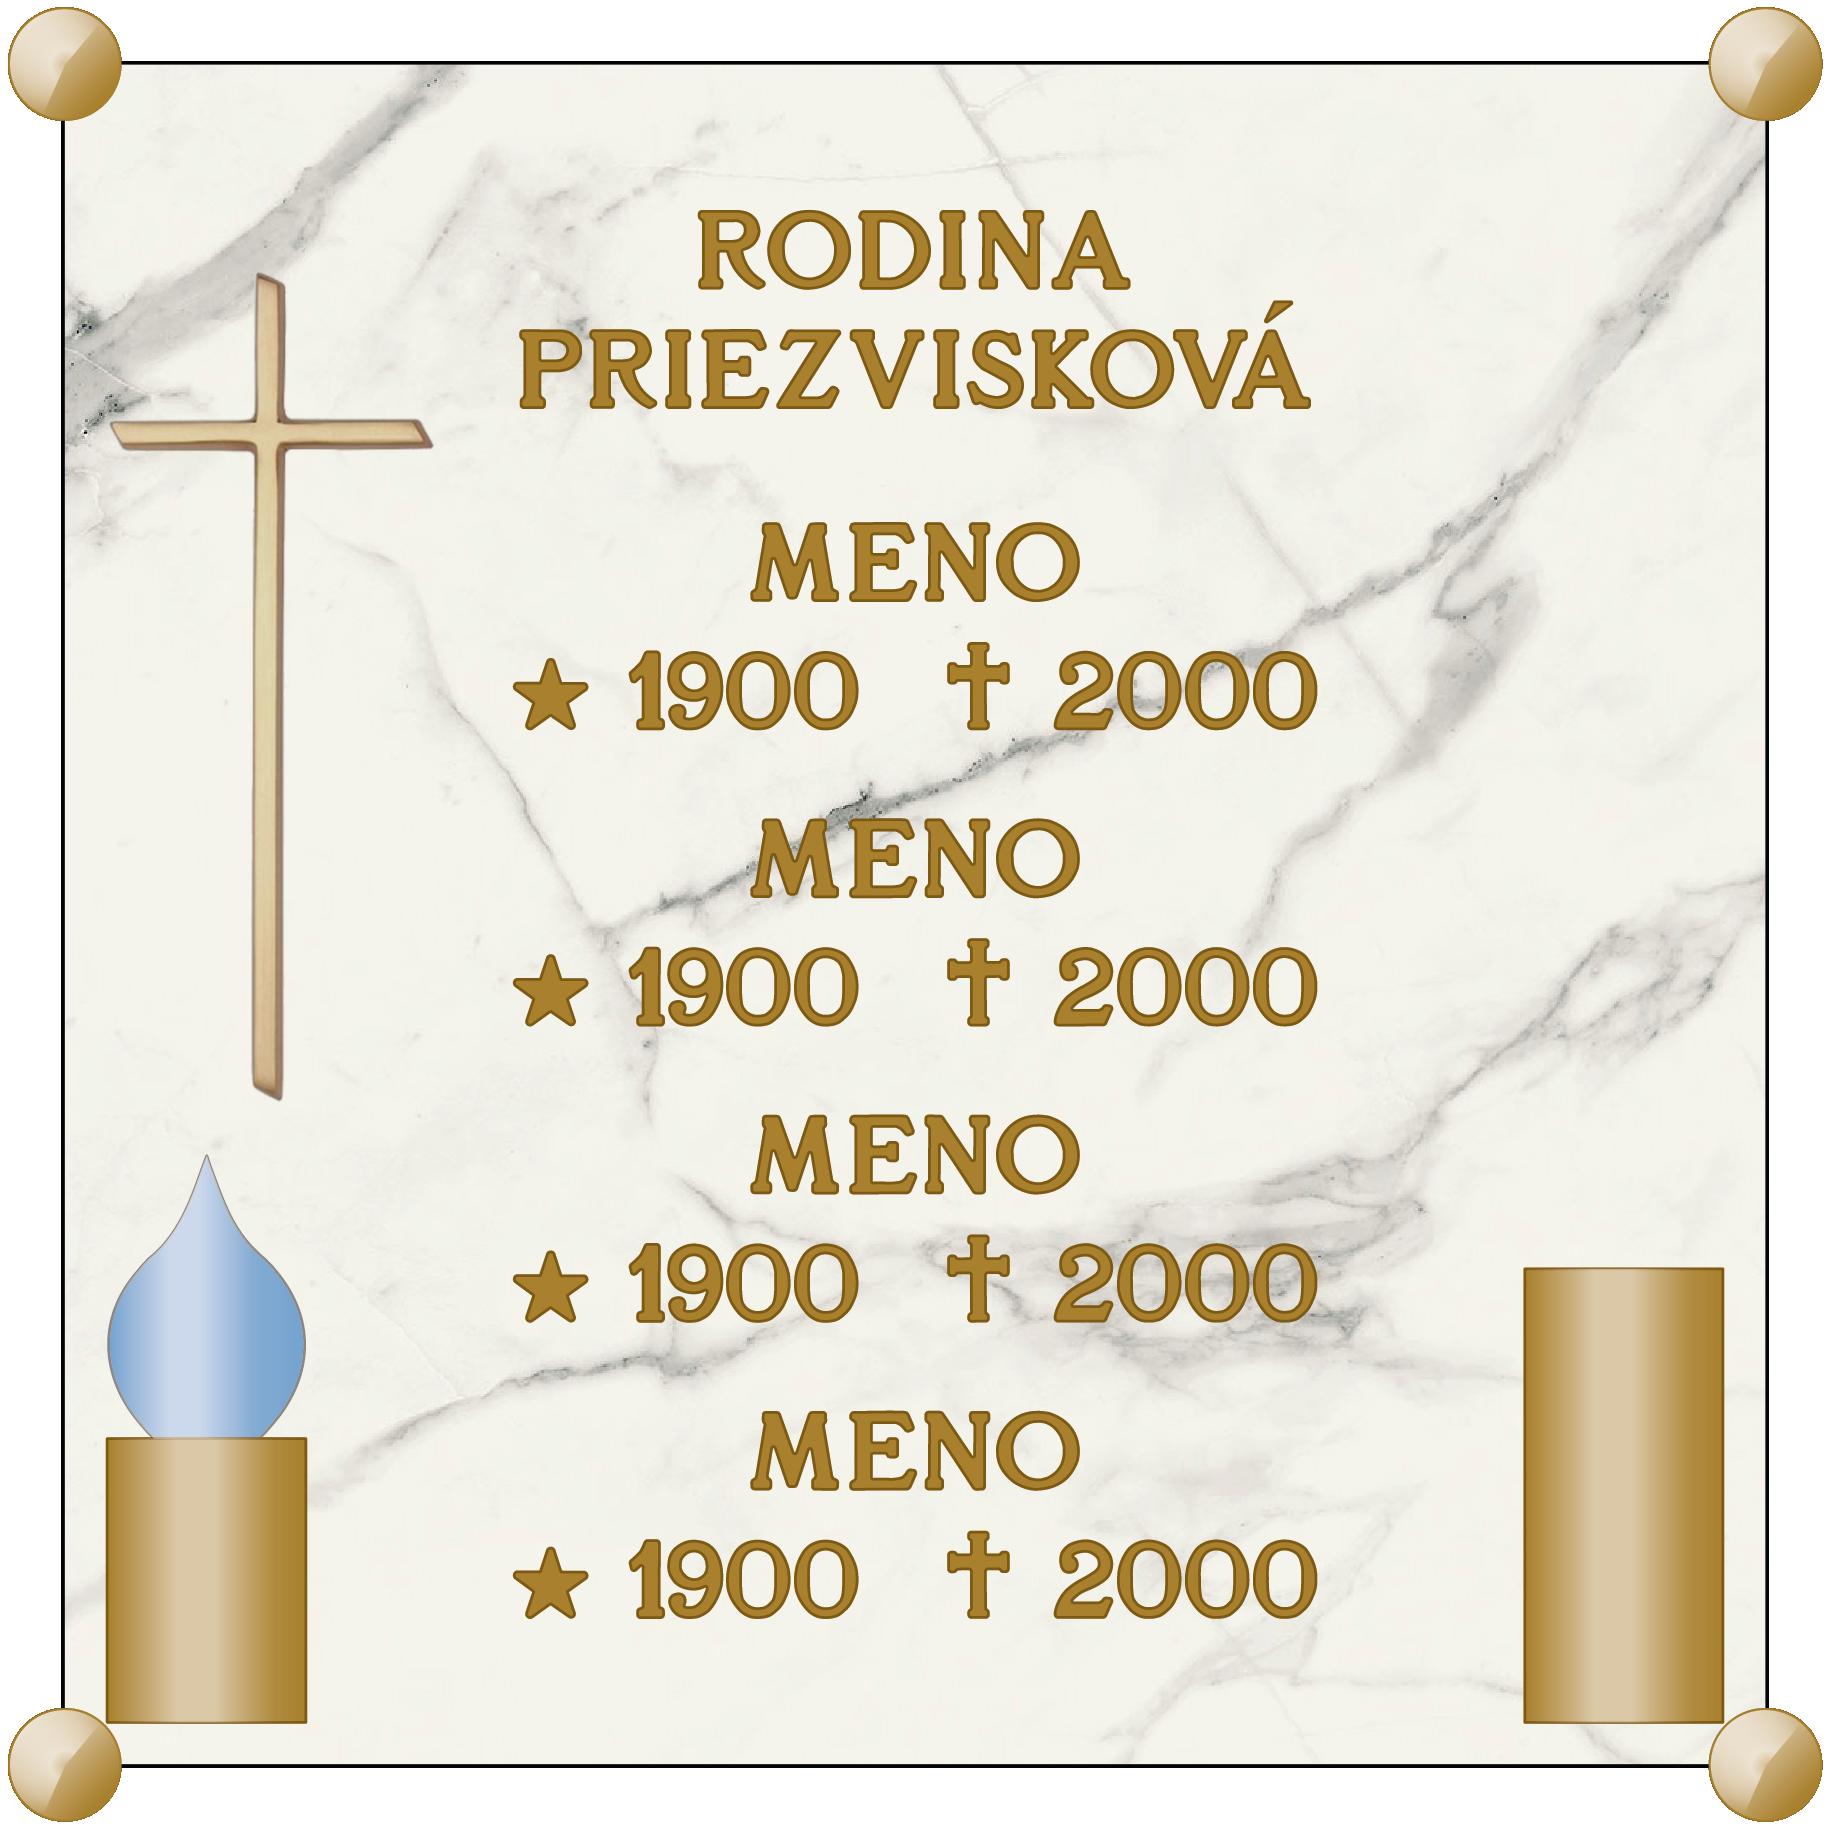 ROMANO_60x60_60x60_3b